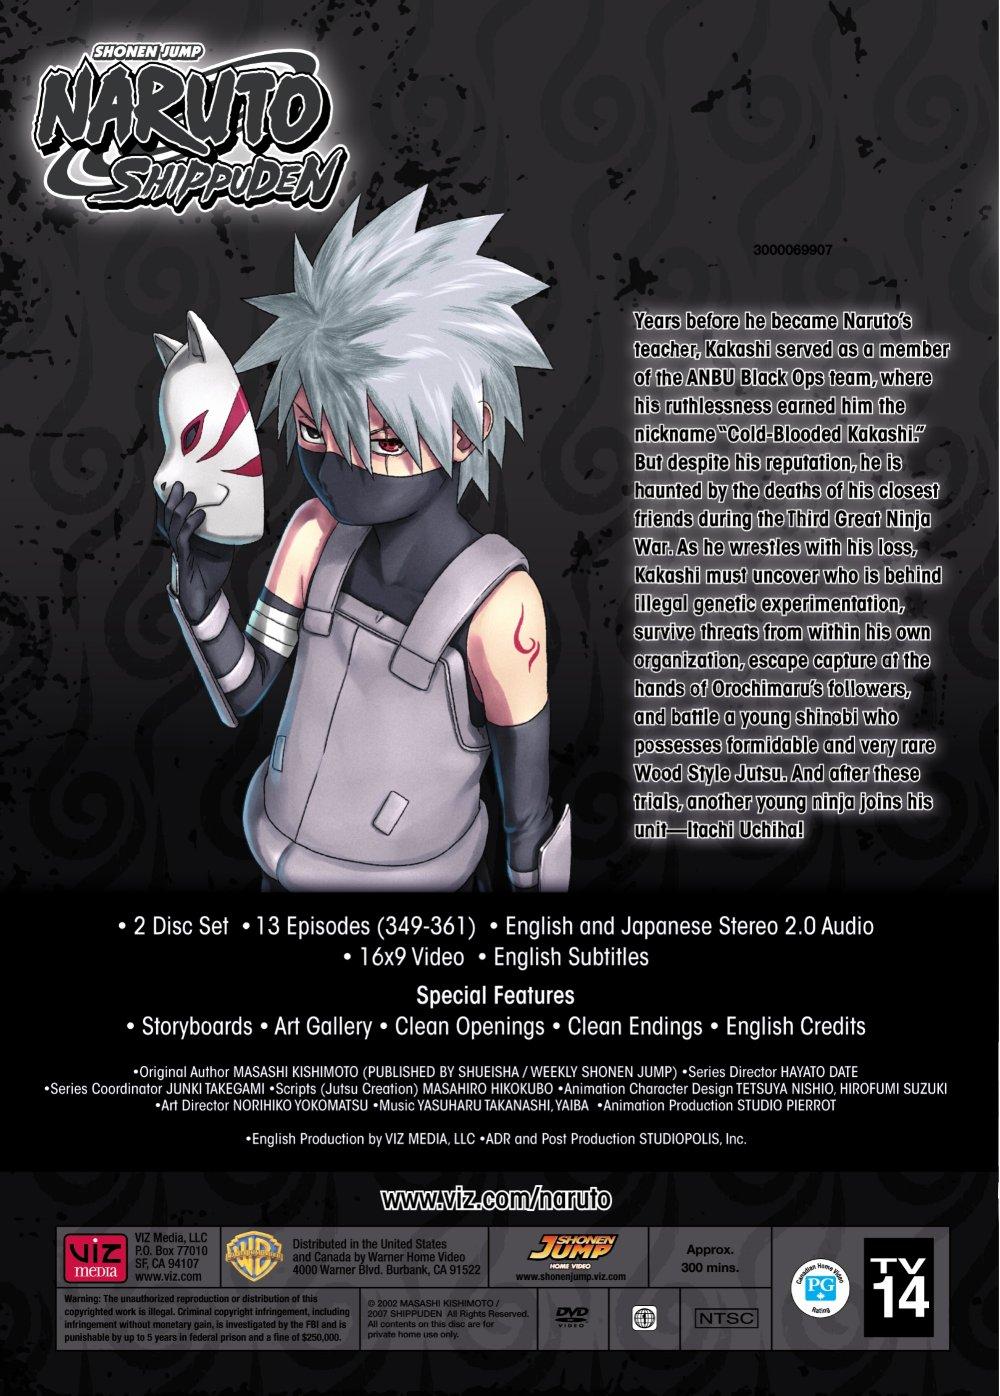 Naruto Shippuden DVD Set 28 Uncut